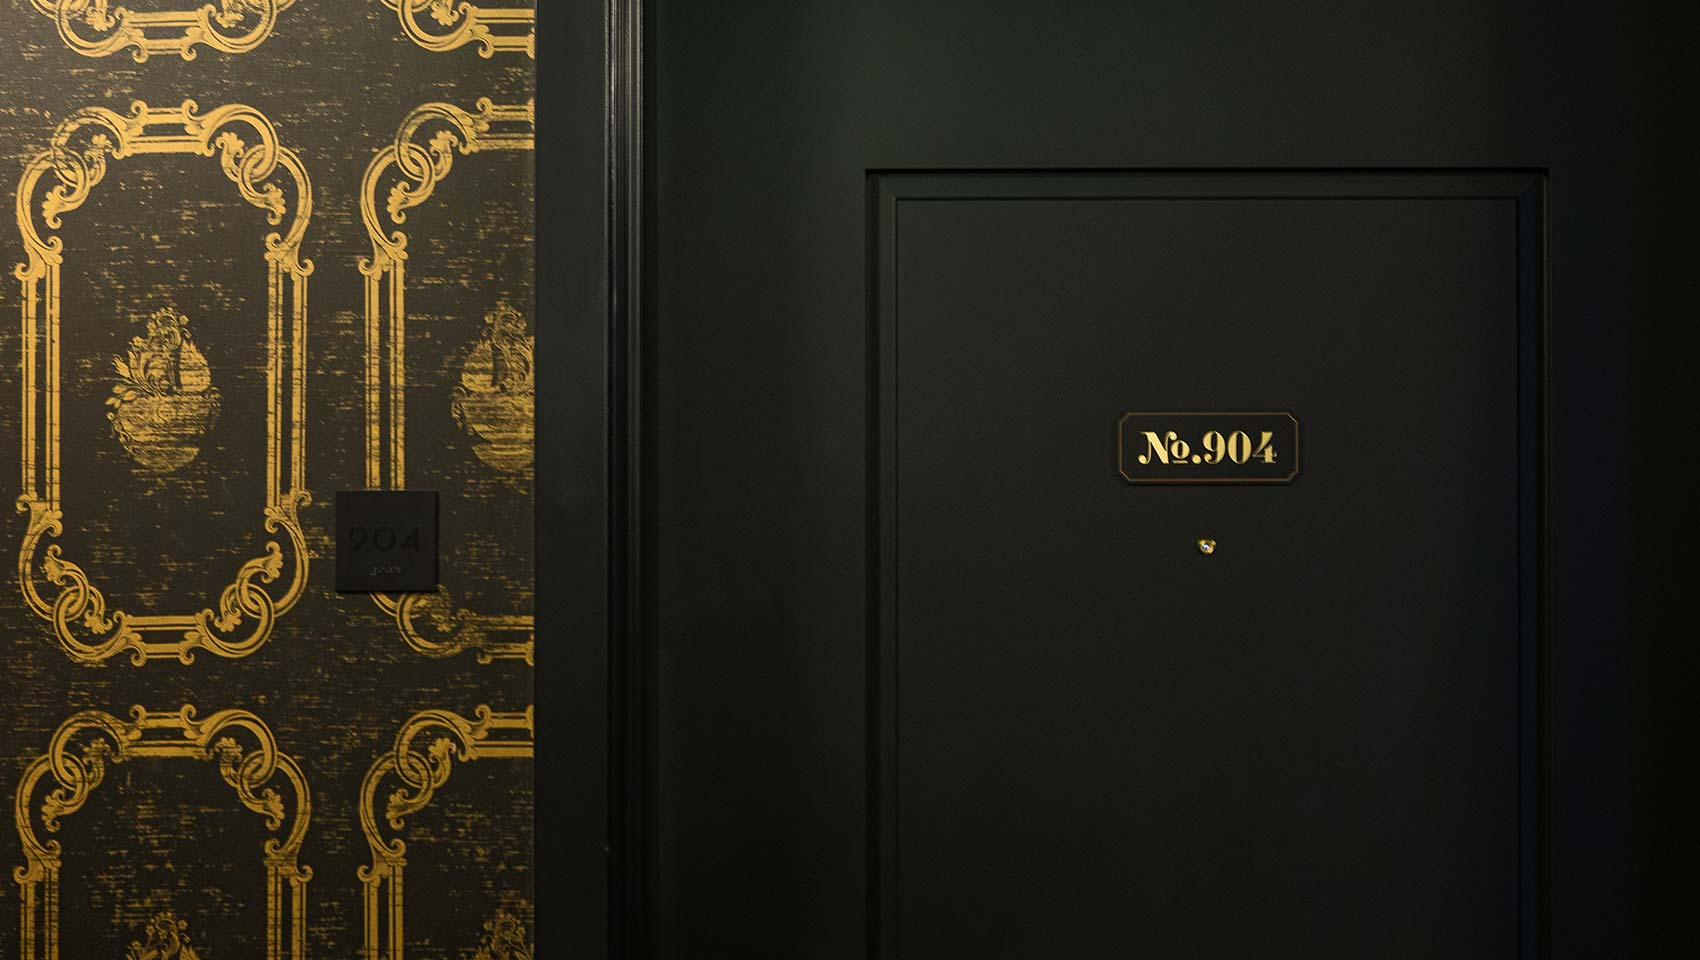 Image courtesy of the  Palladian Hotel